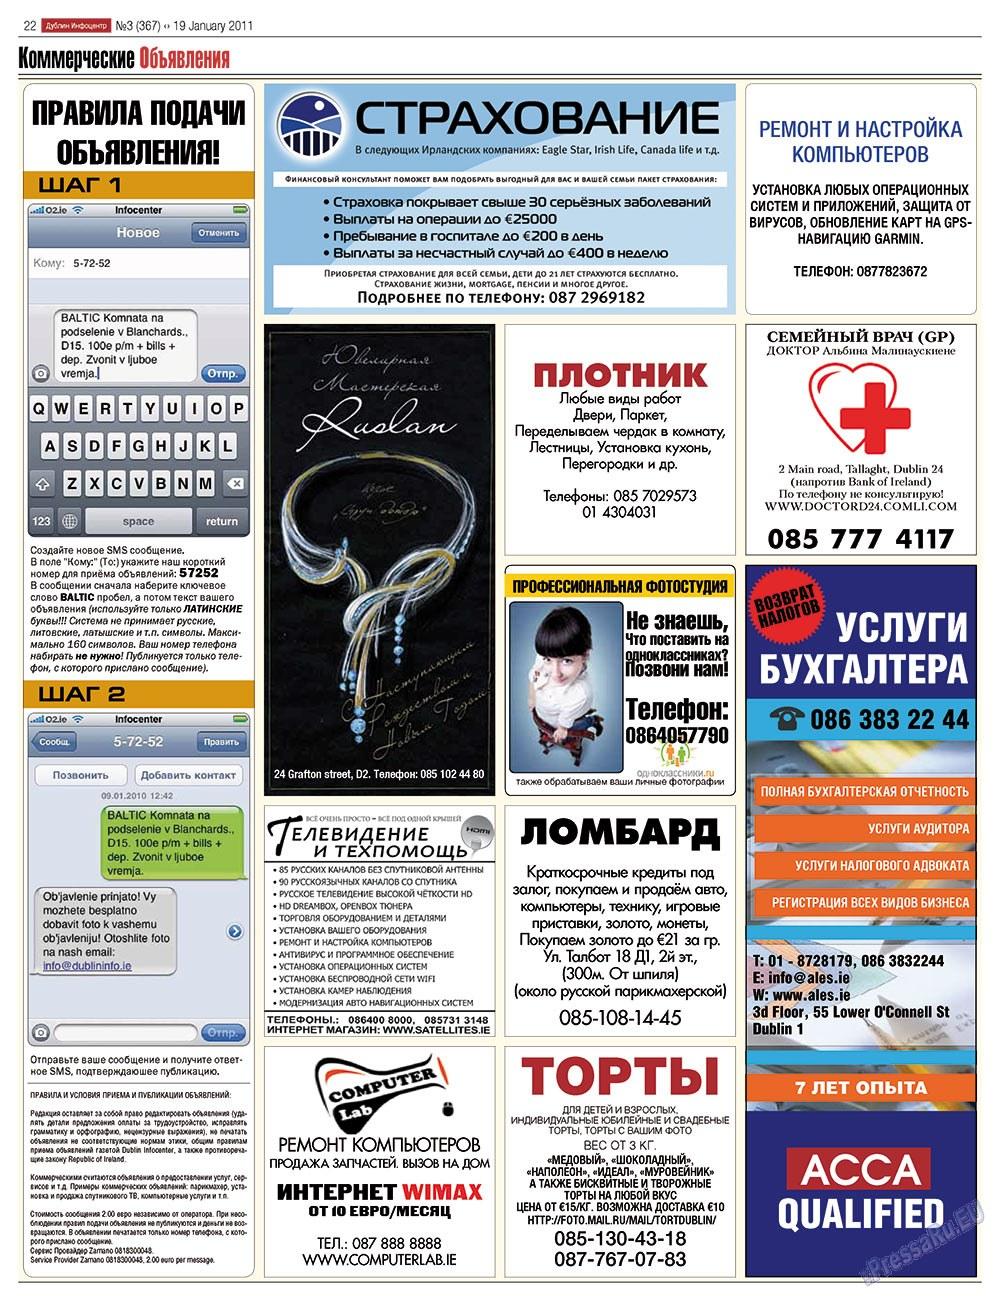 Дублин инфоцентр (газета). 2011 год, номер 3, стр. 22